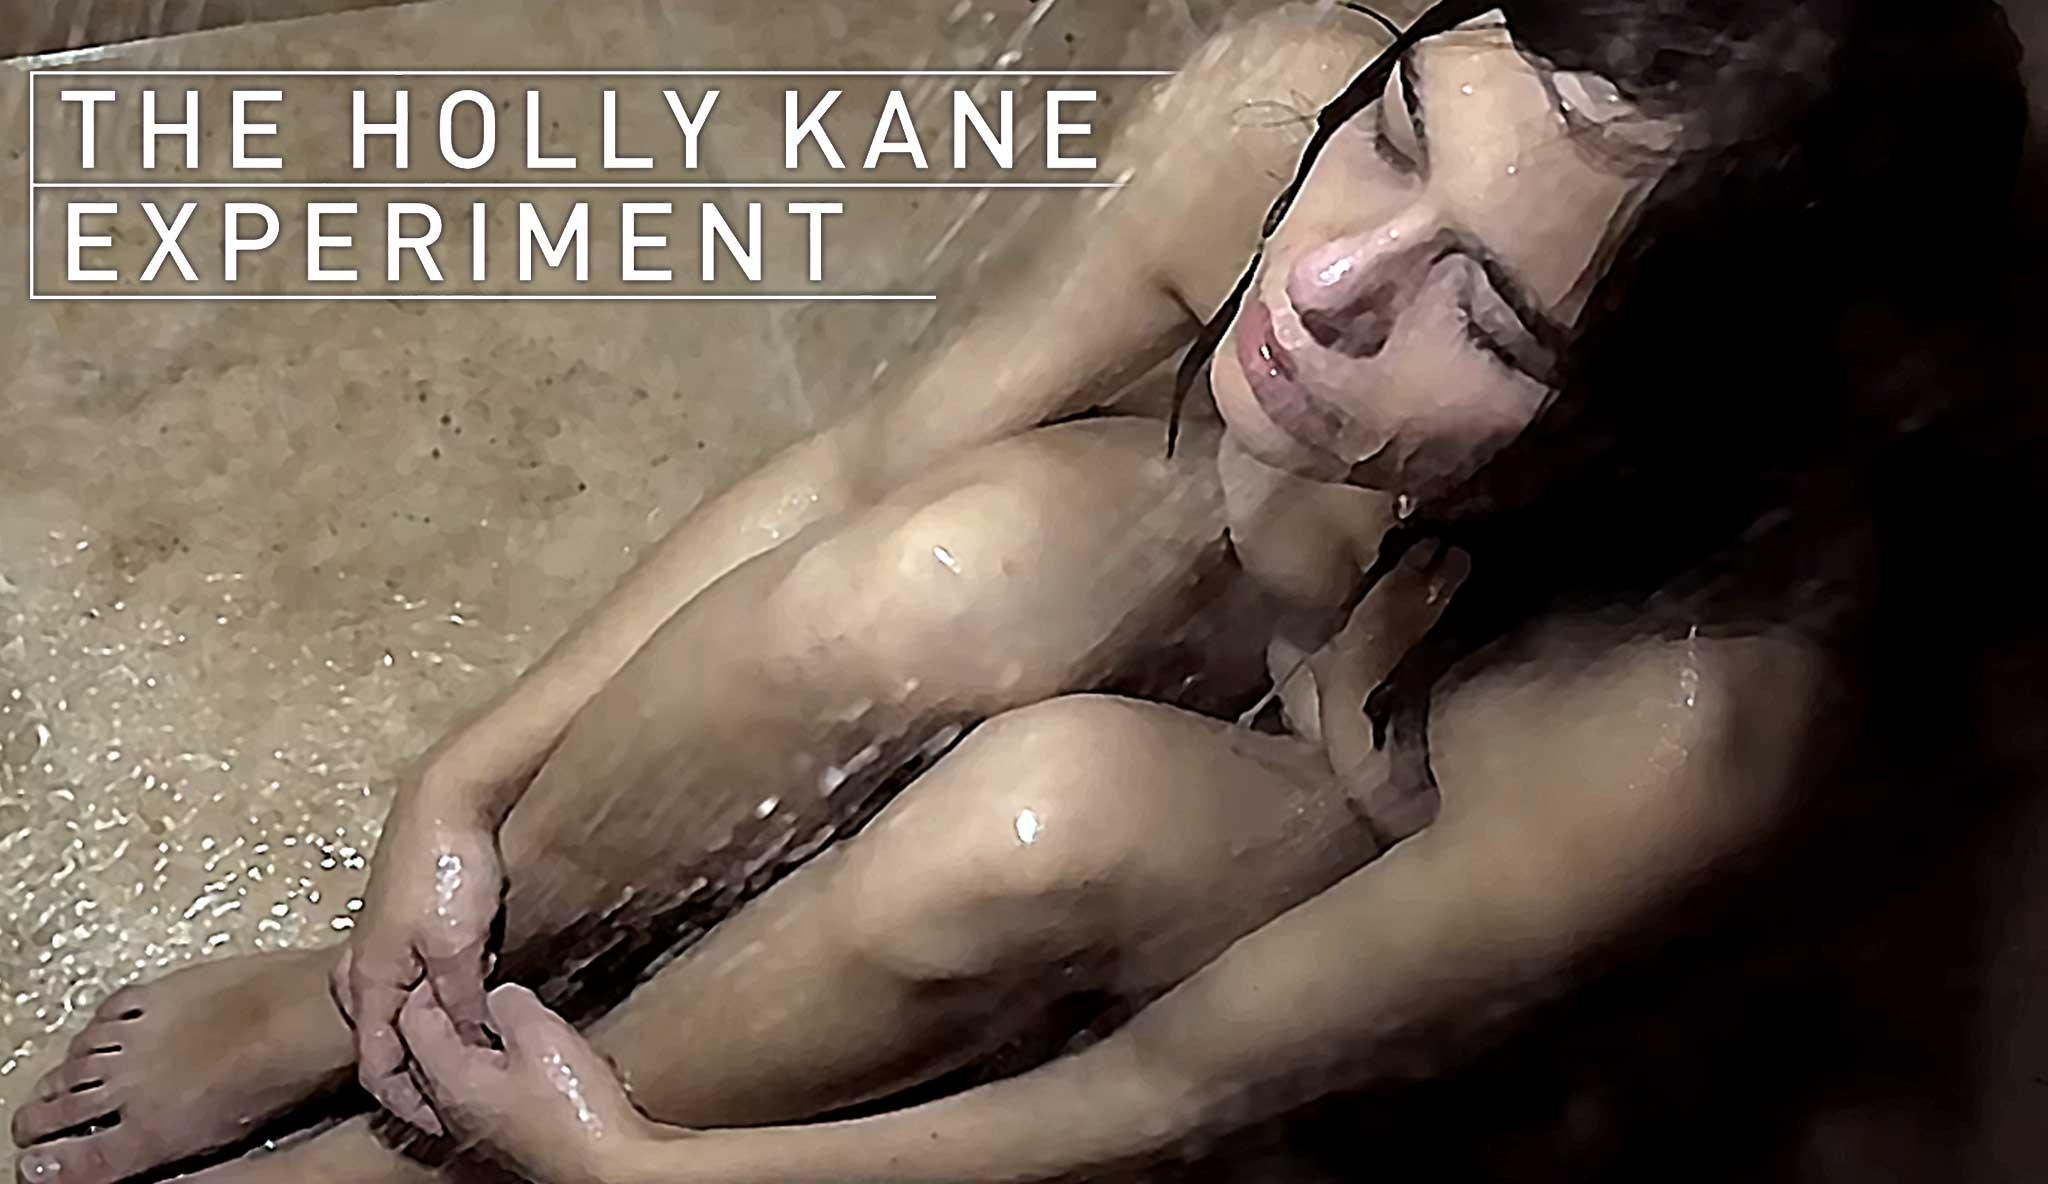 the-holly-kane-experiment\header.jpg